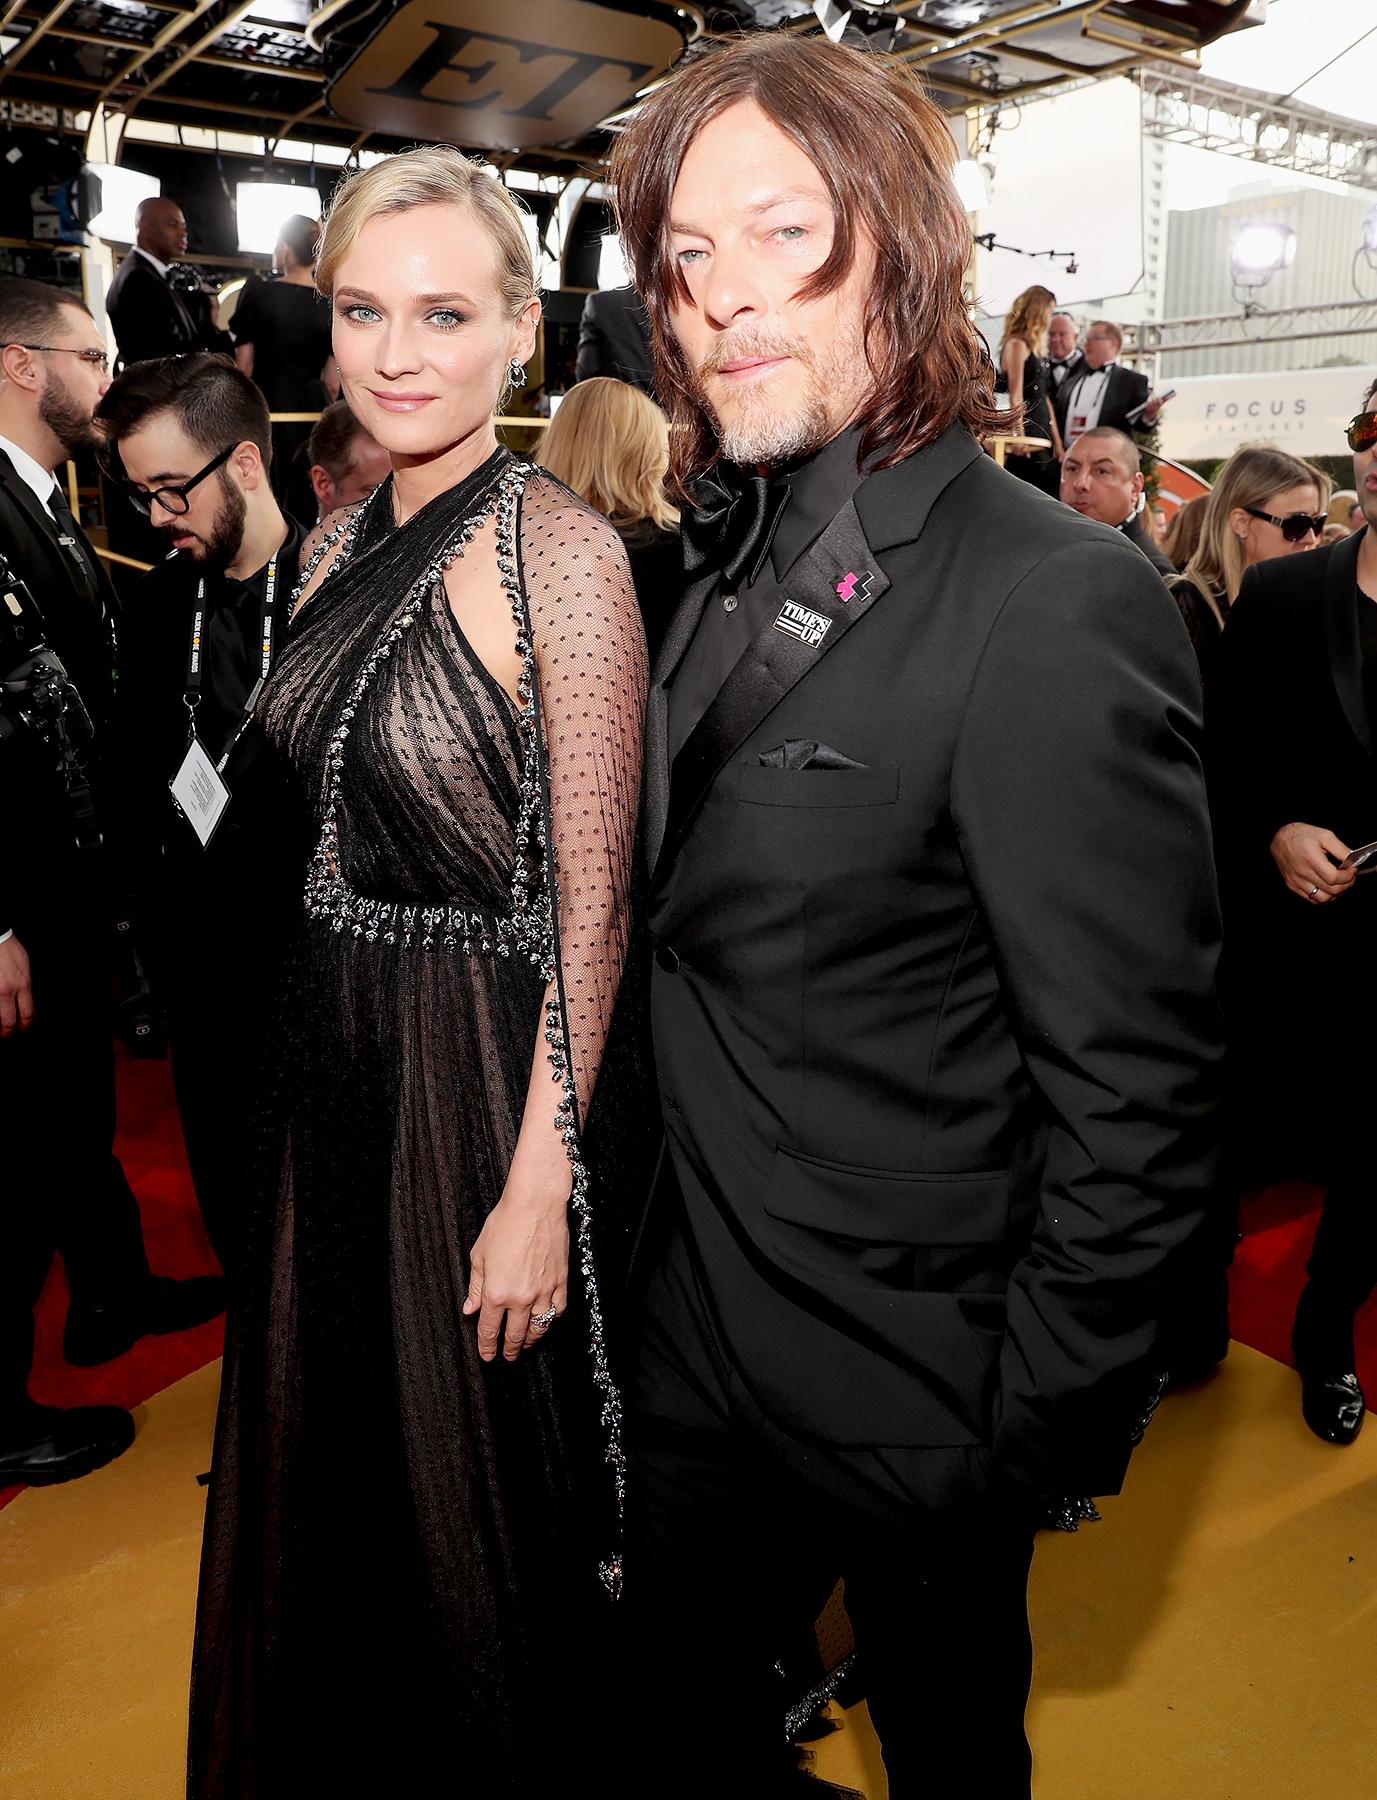 Diane Kruger and Norman Reedus Make Red Carpet Debut at Golden Globes 2018: Kiss Photo